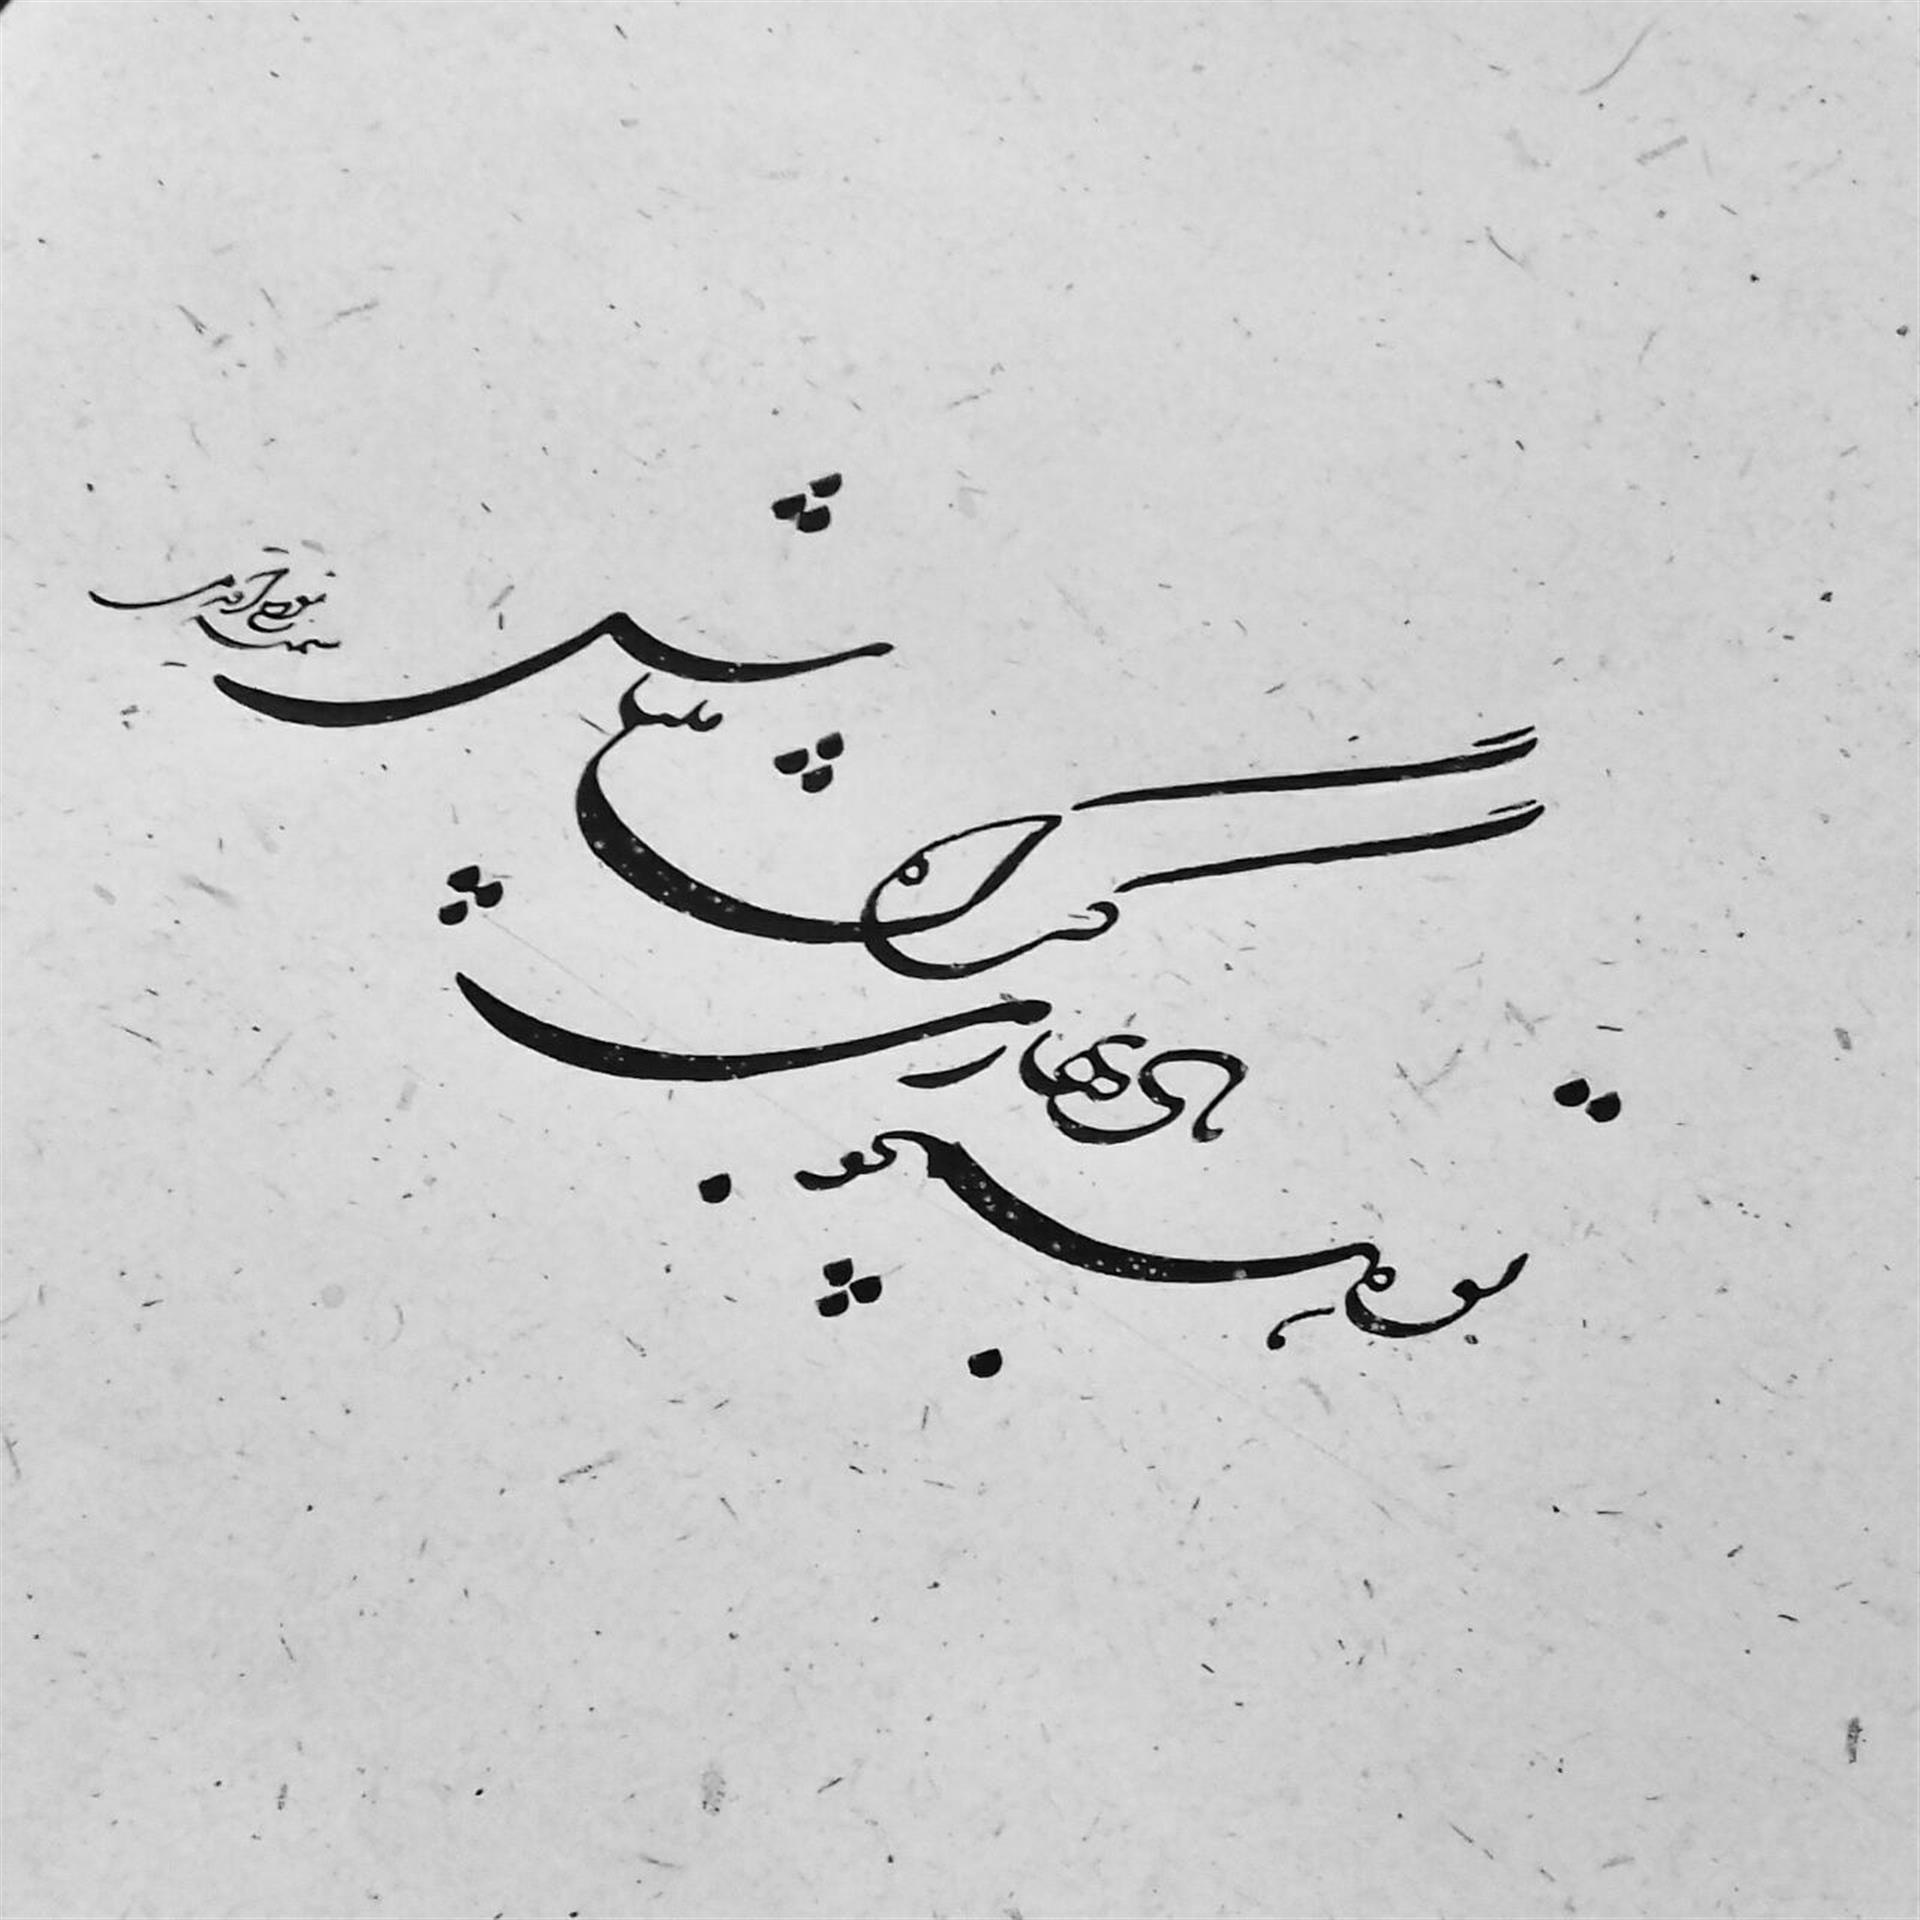 اثر سمیه نوحی اقدمی در هنر خوشنویسی محفل خوشنویسی 100هنر Islamic Art Calligraphy Farsi Calligraphy Art Caligraphy Art